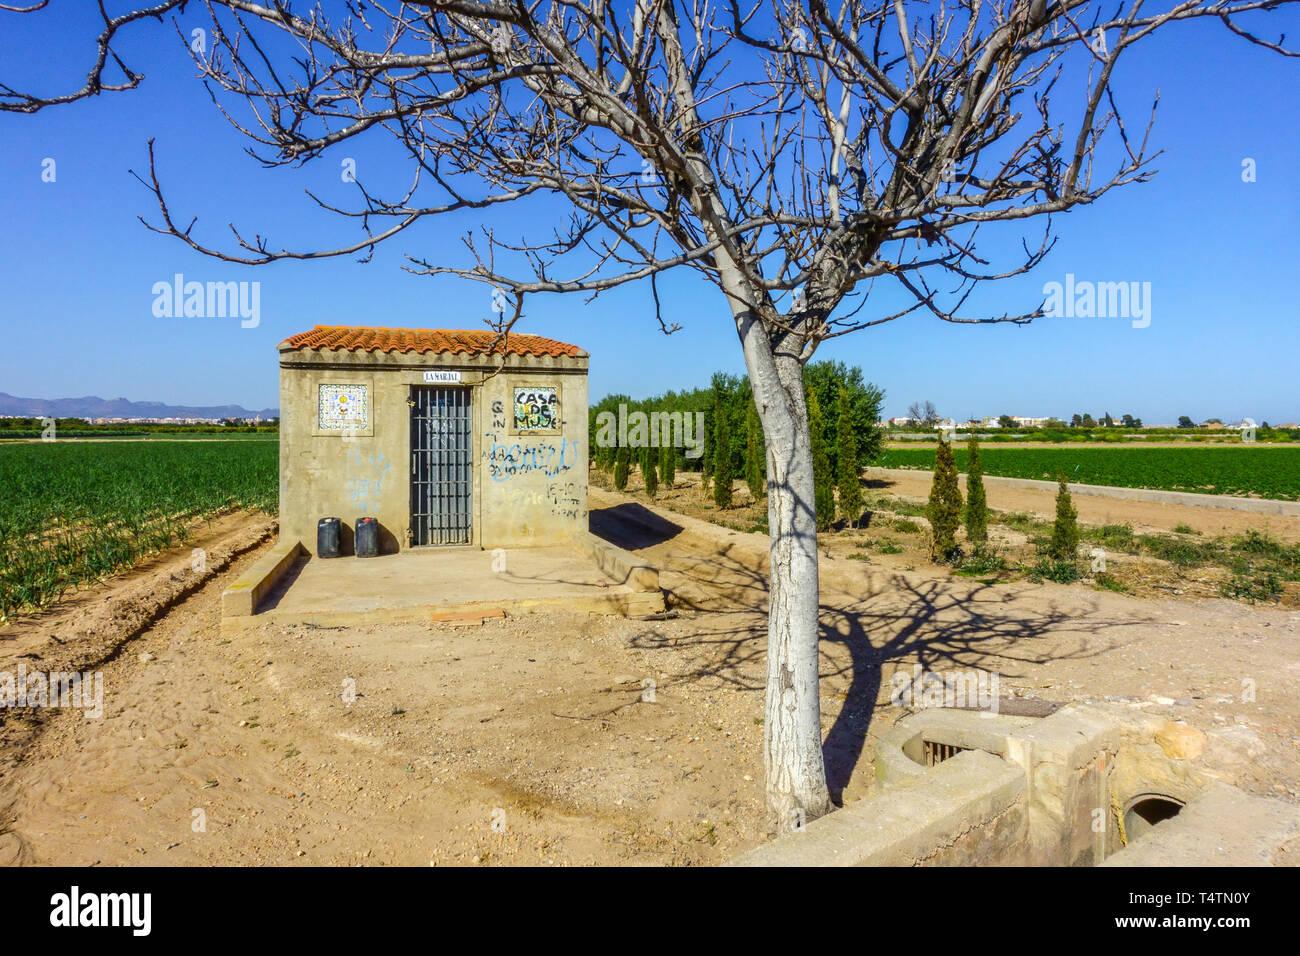 Spain farm, agriculture field in Valencia region, small farmhouse countryside Stock Photo